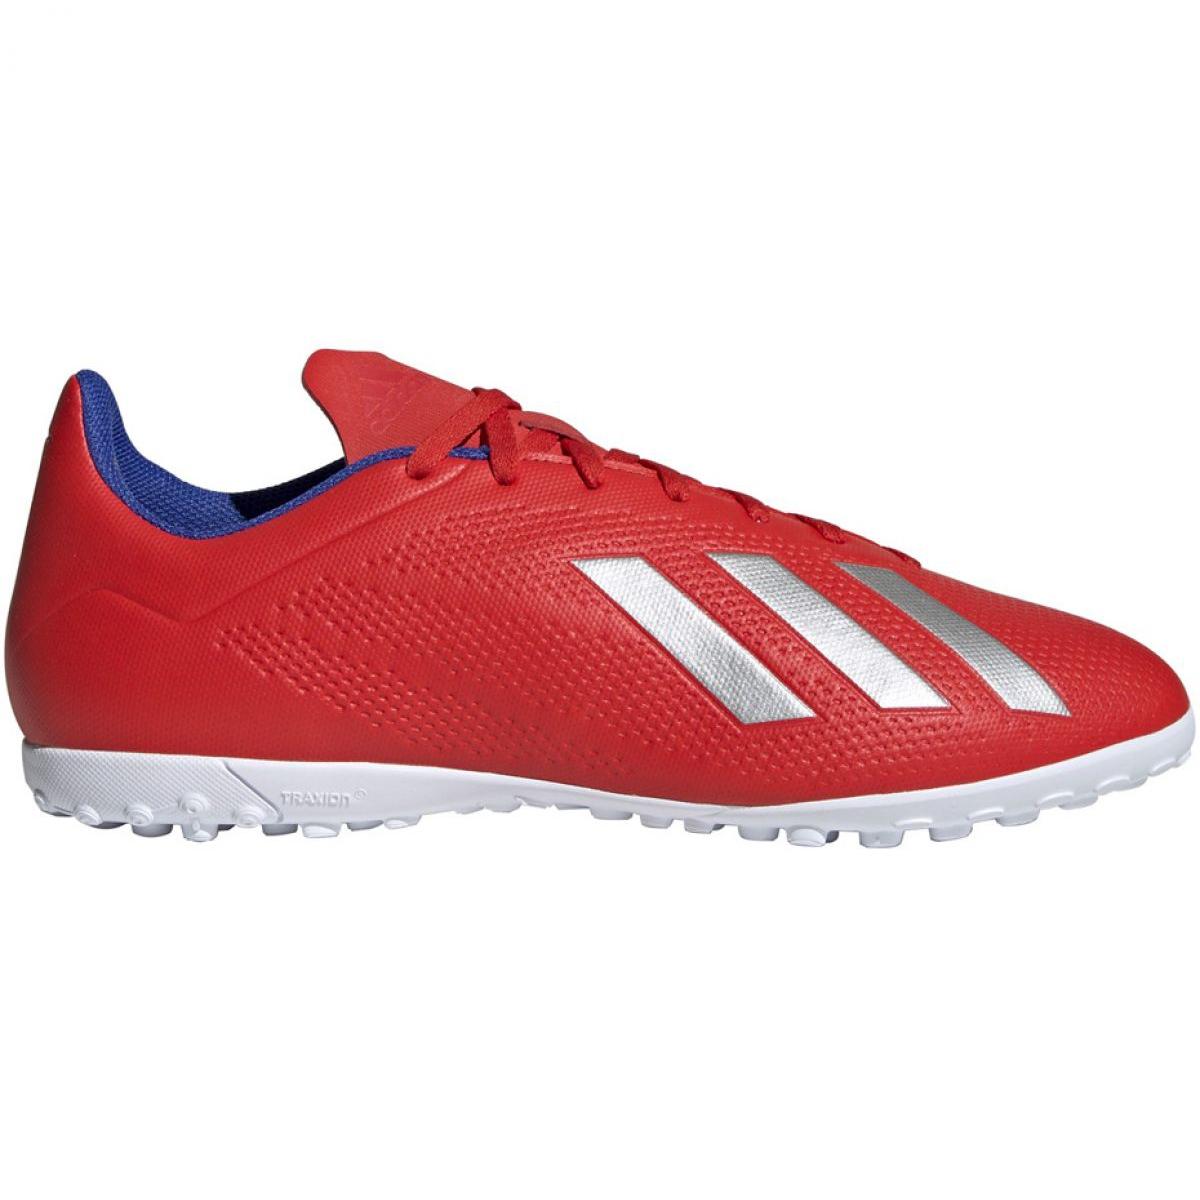 Football Chaussures Adidas X 18.4 TF M bb9413